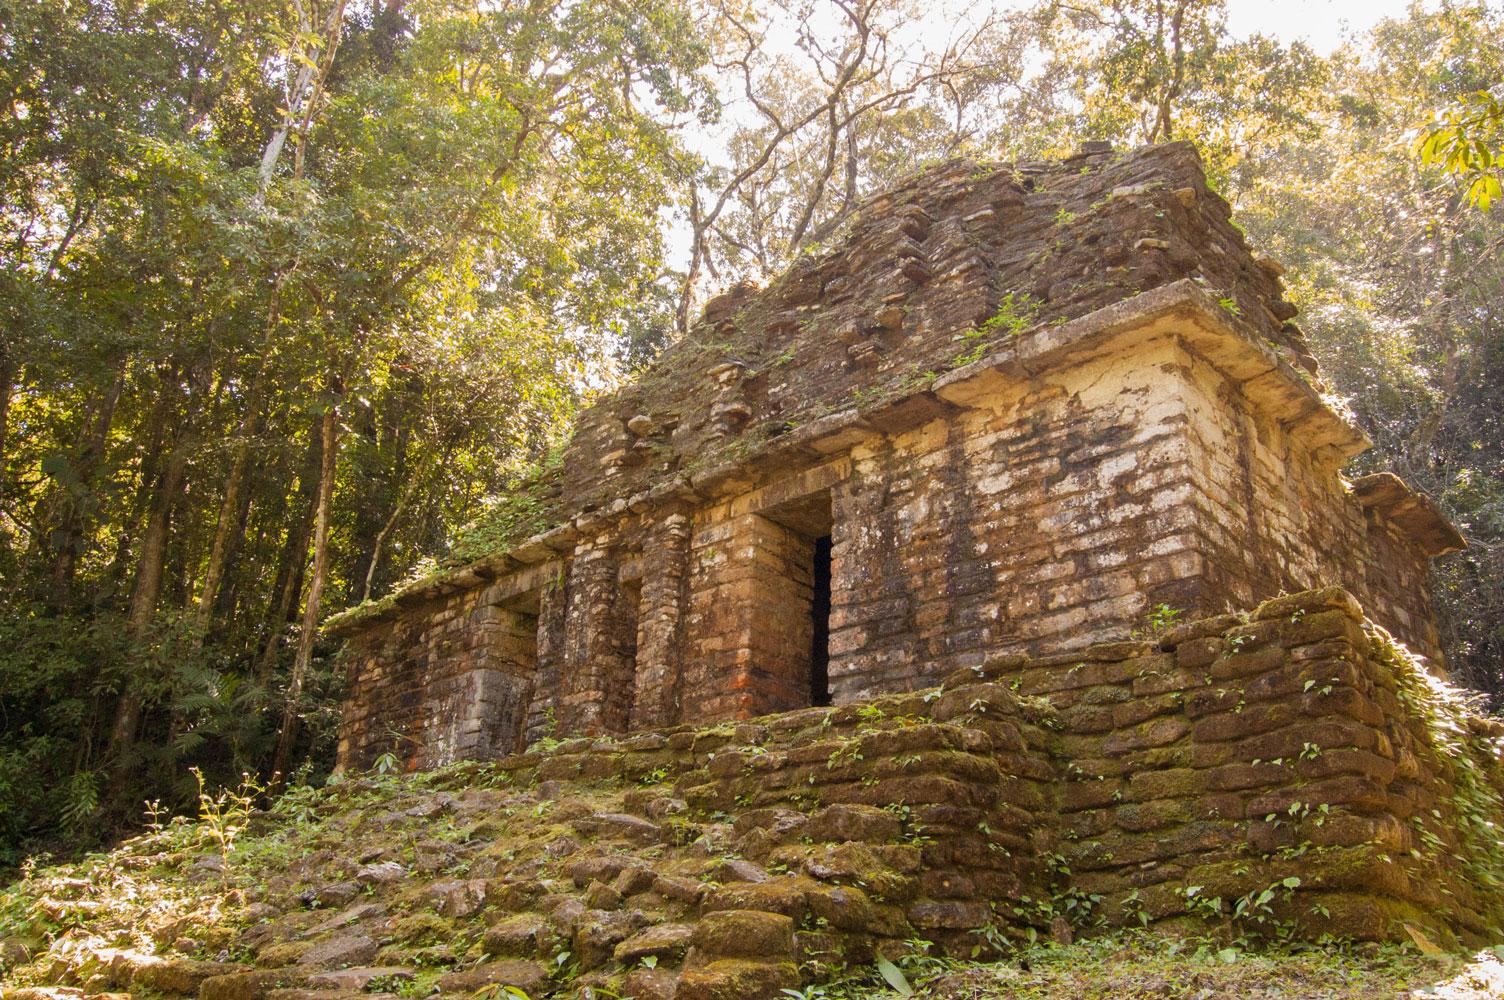 tours_en_chiapas_bonampak_yaxchilan_palenque_guias_en_chiapas_selva_lacandona_mayas_lacandones_zonas_arqueologicas_yaxchilan_aventuras_chankin_01